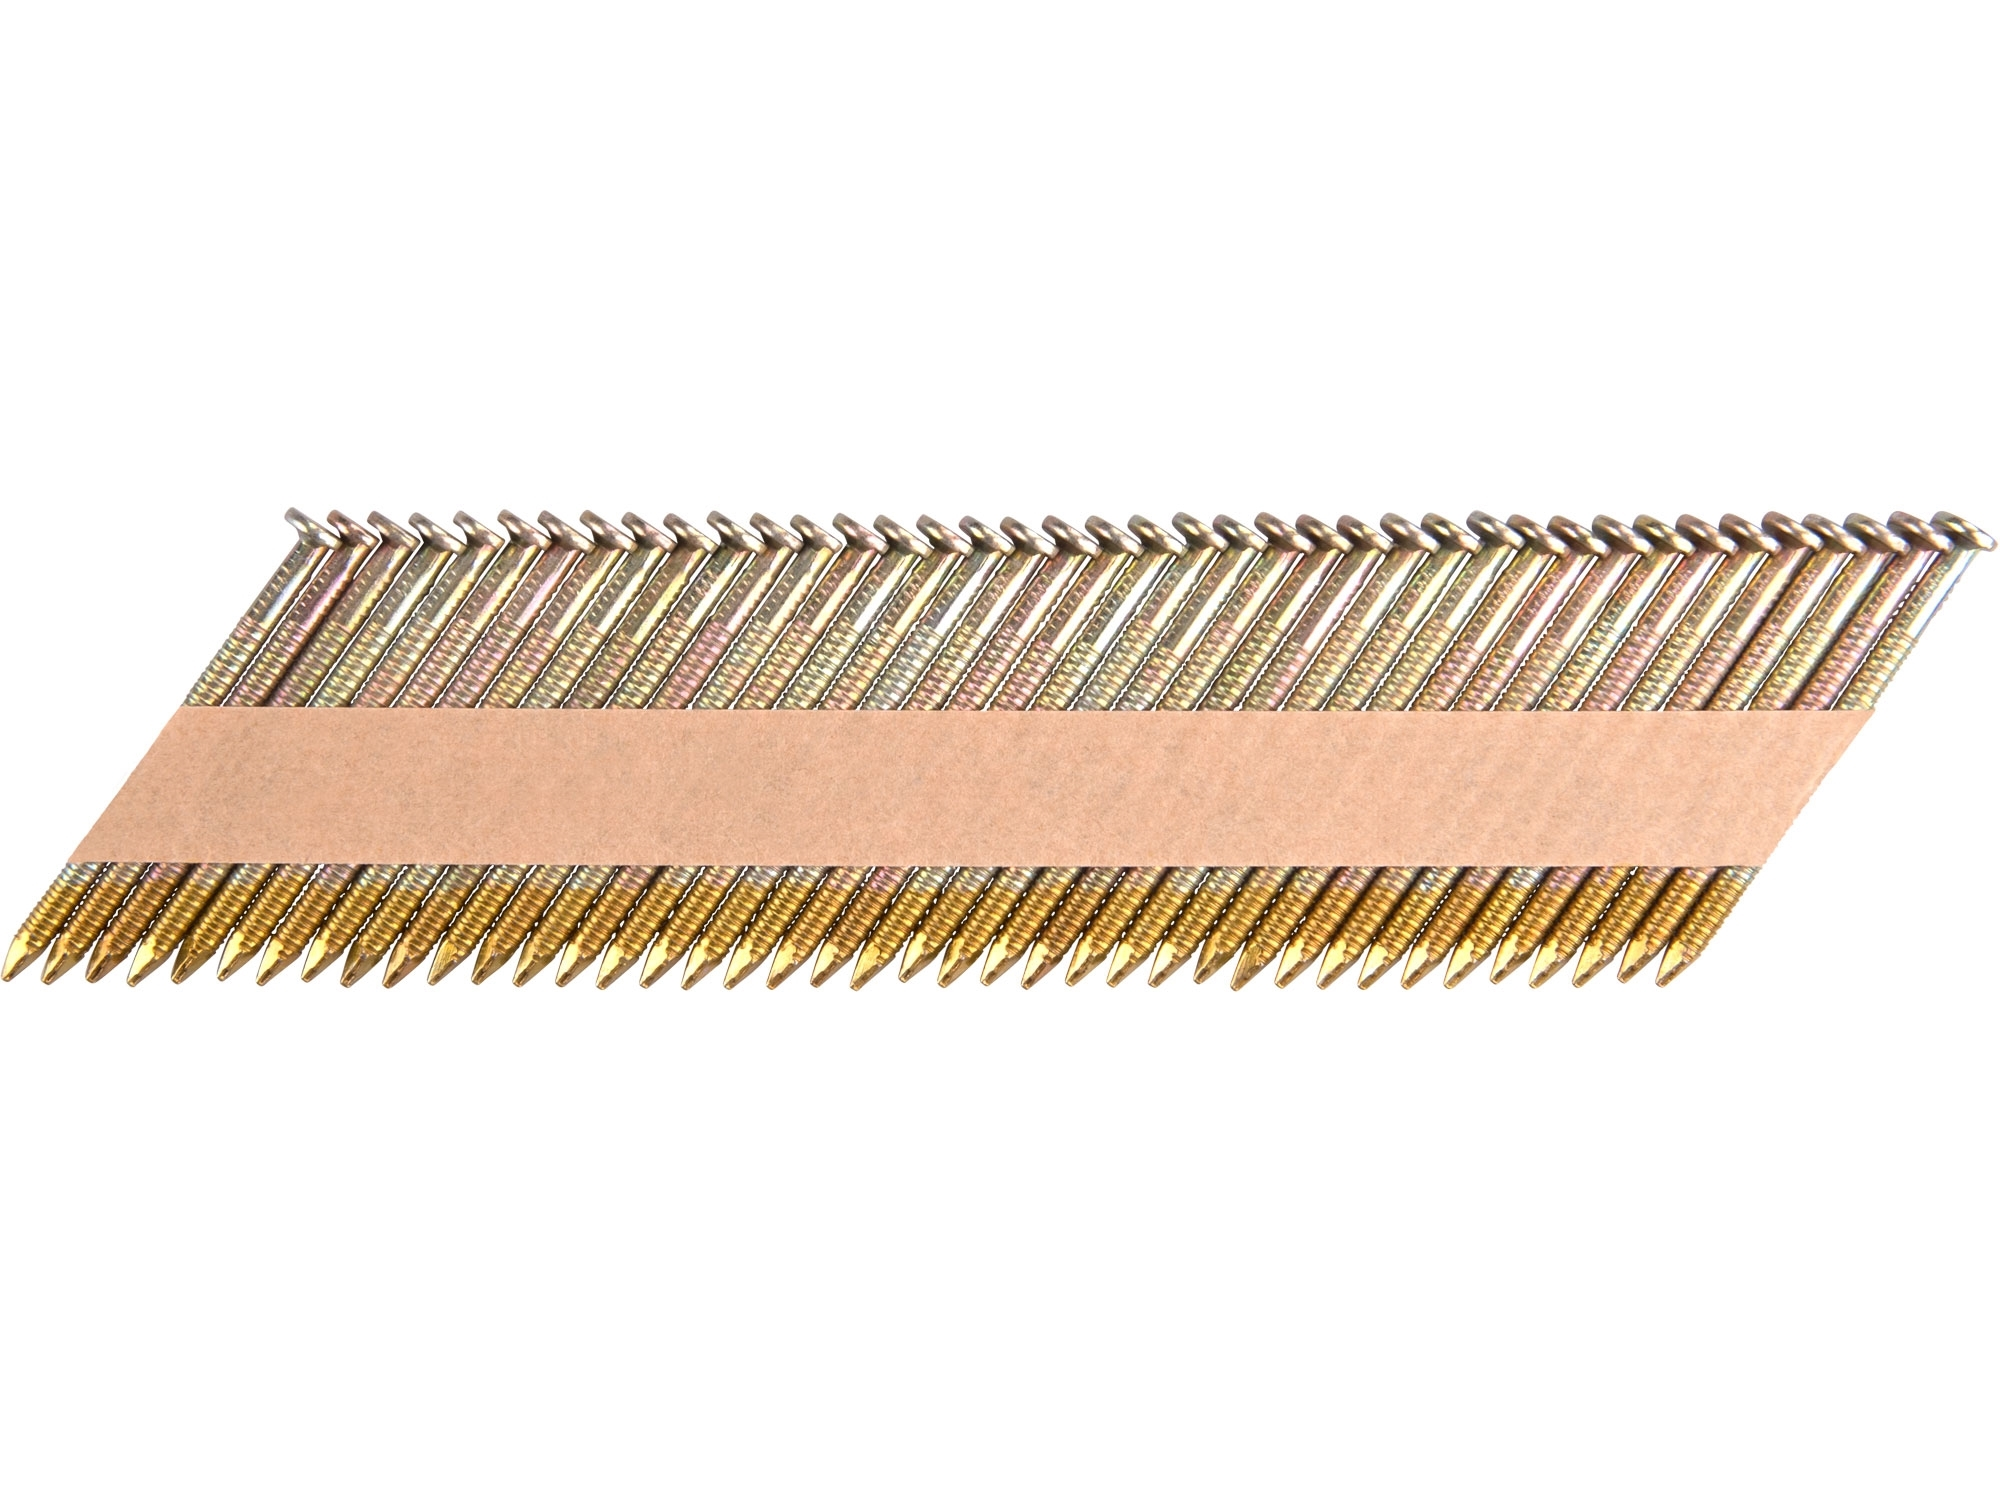 hřebík nastřelovací, 480ks, 50mm, pr.3,05mm, EXTOL PREMIUM 8862603